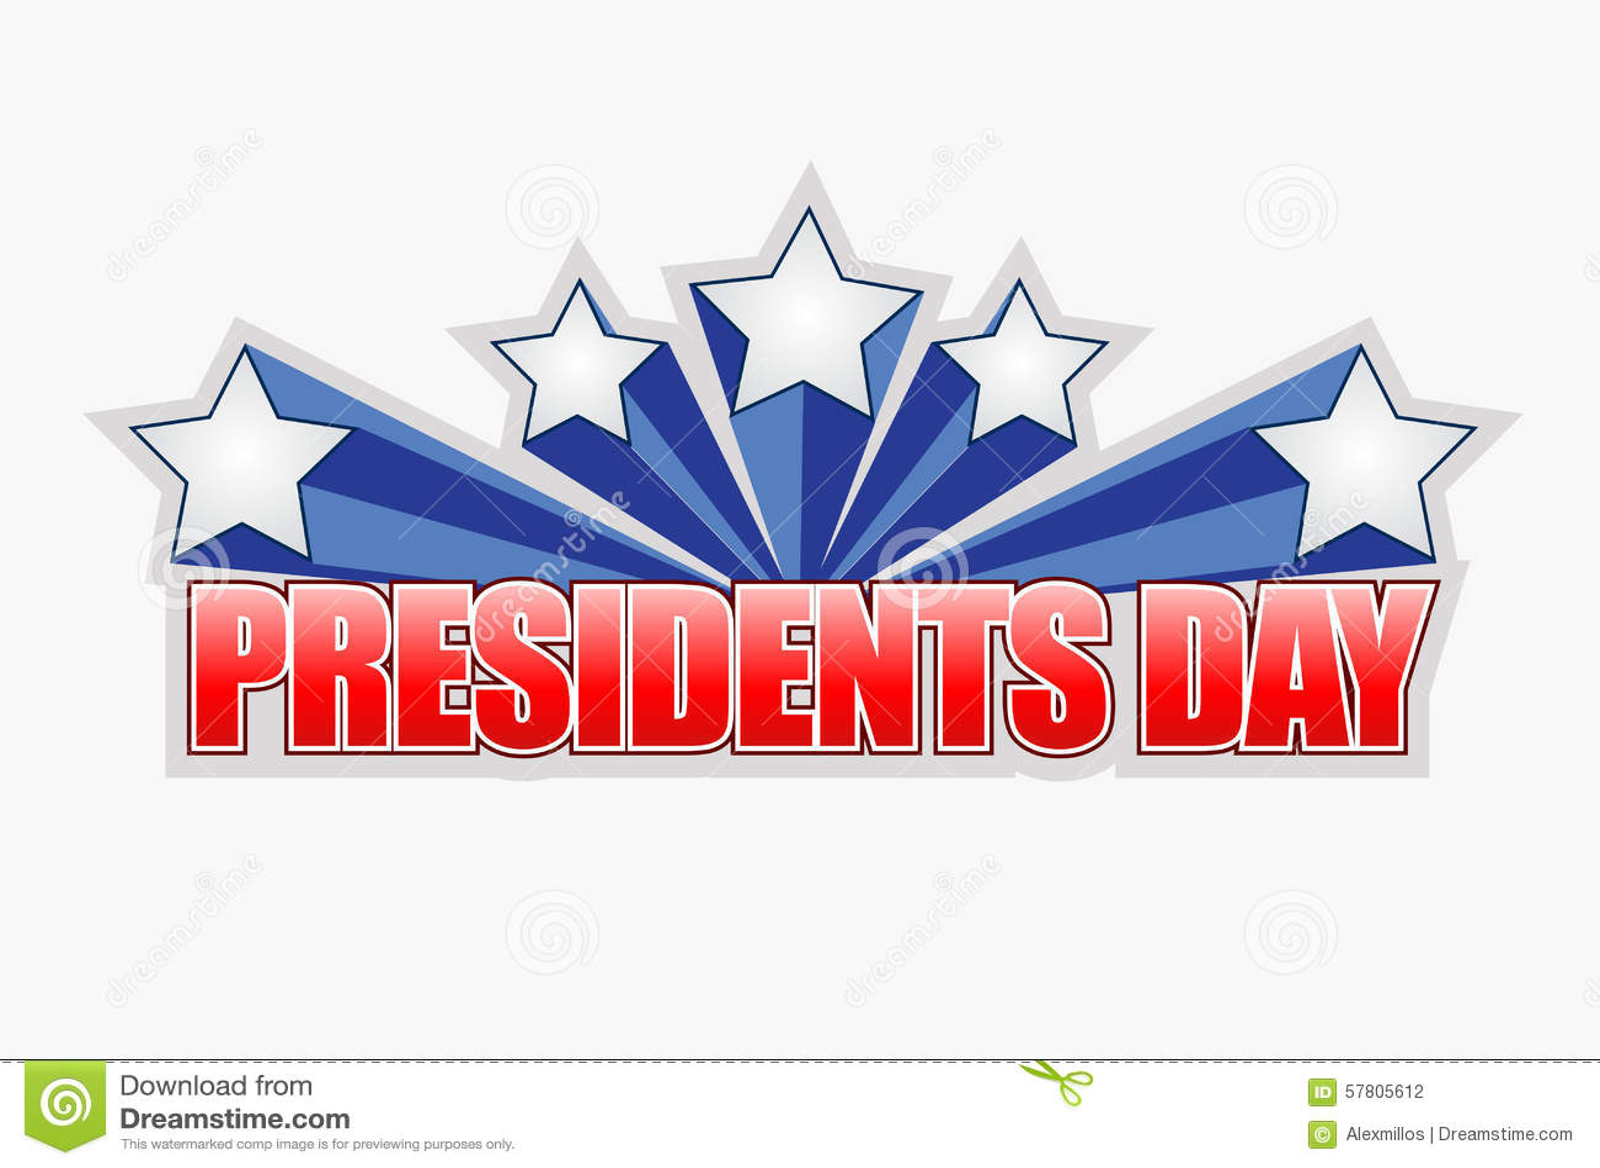 presidents day sign illustration design stock illustration